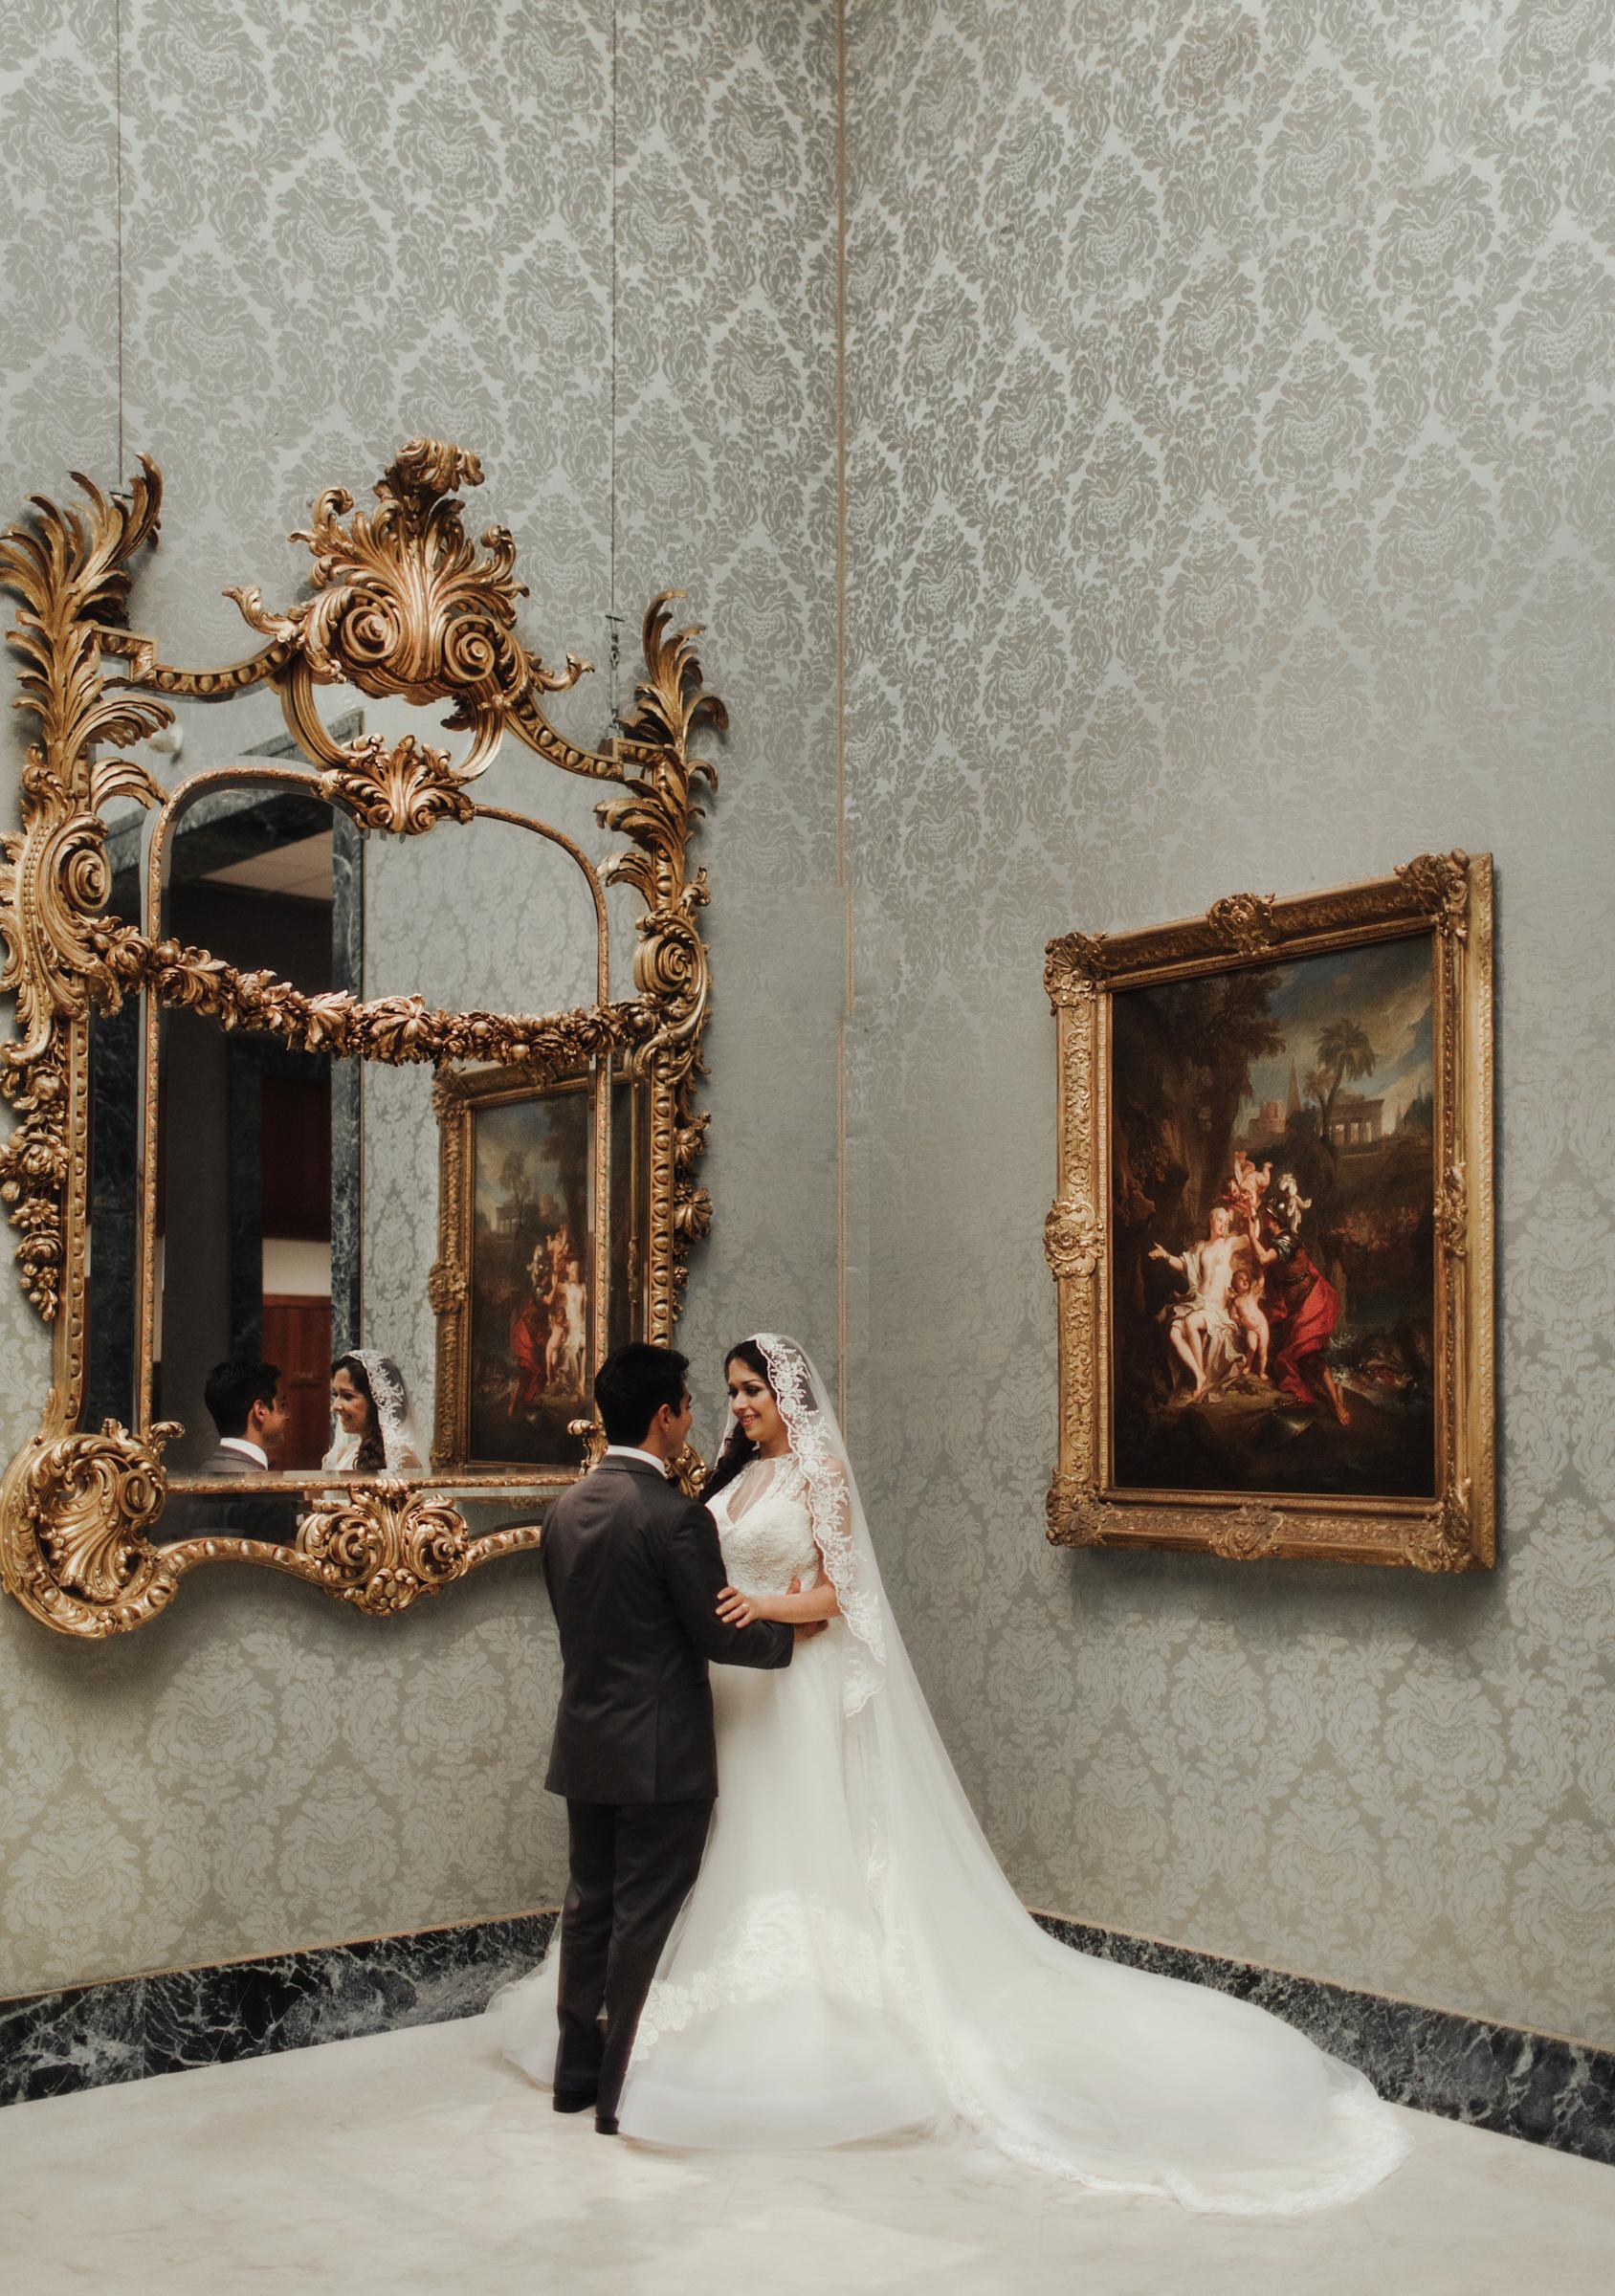 wedding day | MFA St Pete | Vanessa Boy Photography | vanessaboy.com-245.com |final.jpg